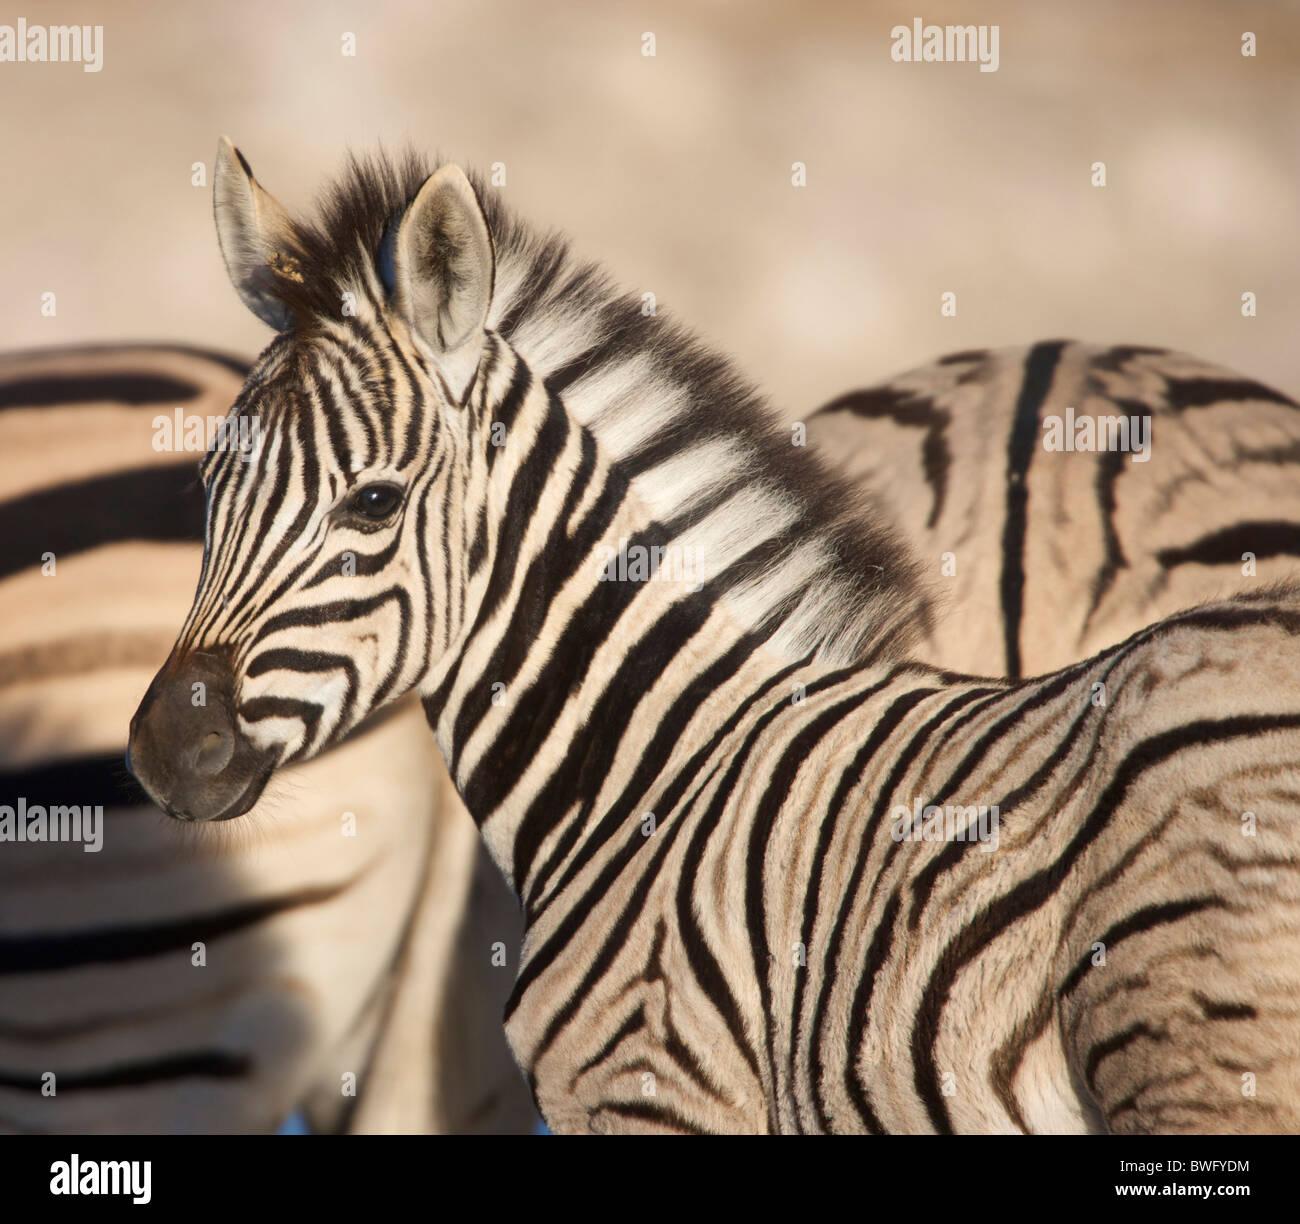 Burchell's Zebra (Equus quagga burchellii) foal with adults in background, Namibia Stock Photo